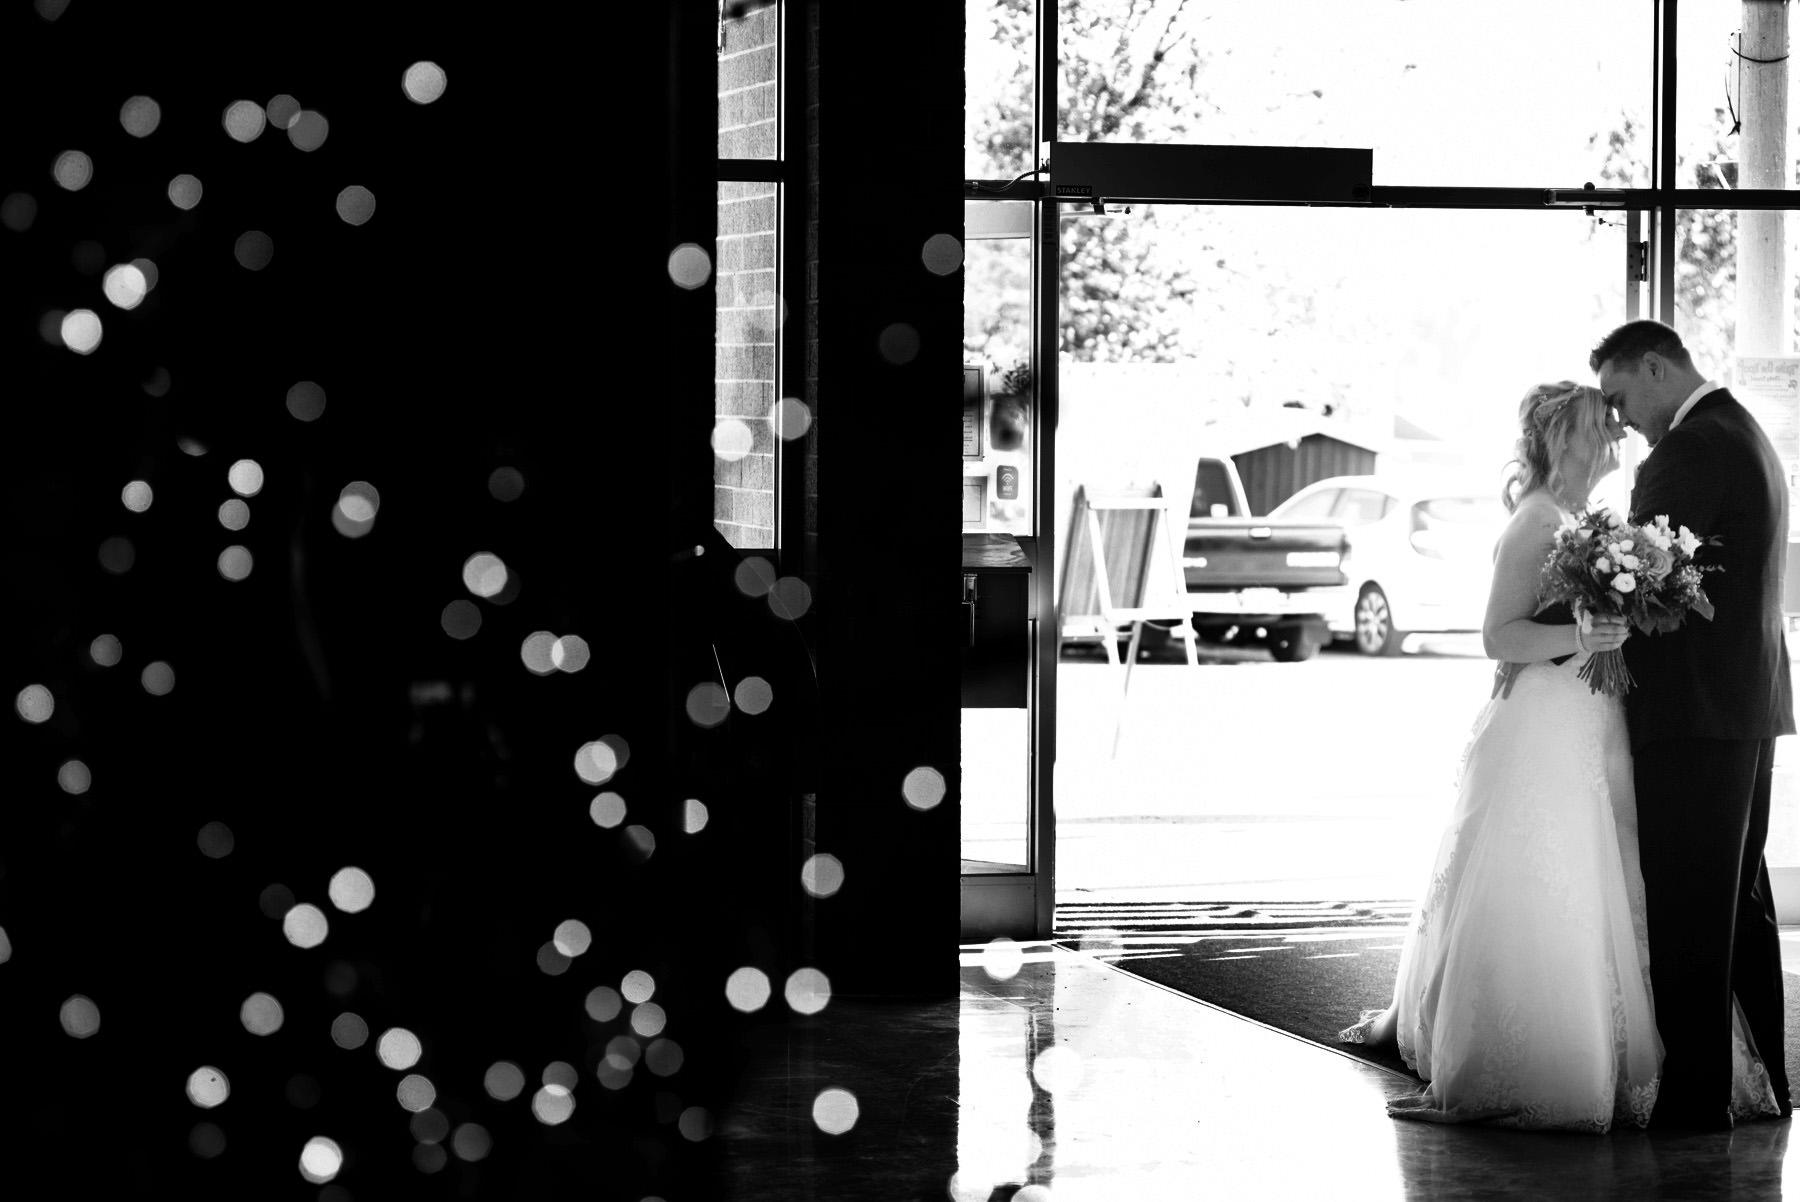 Saanich Fair Wedding Photography